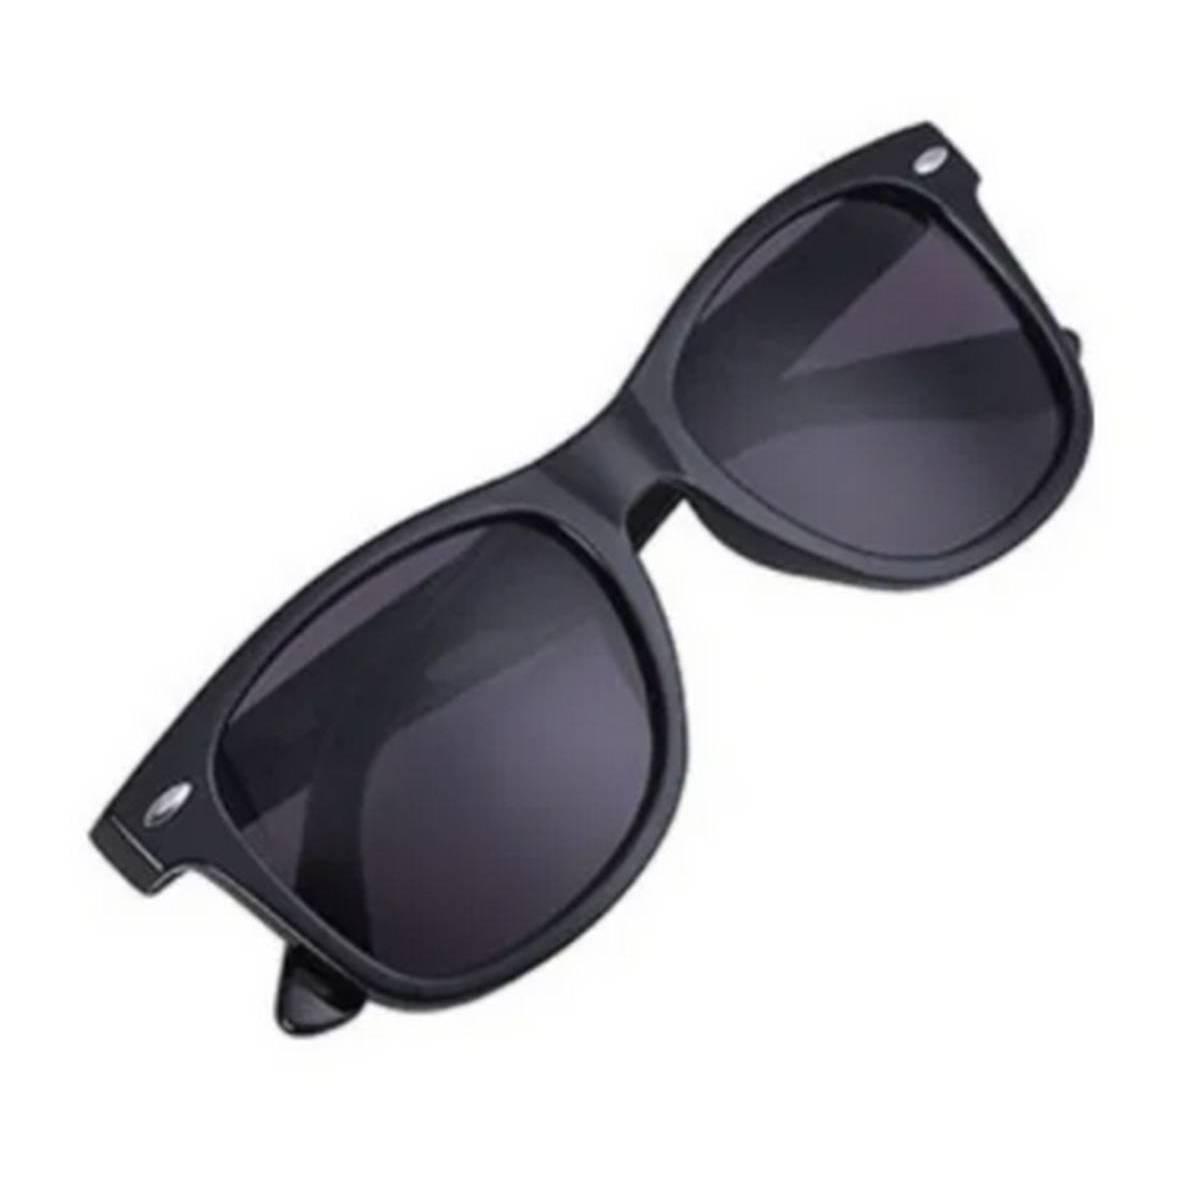 Miniso MARVEL-Sunglasses-2007255910106